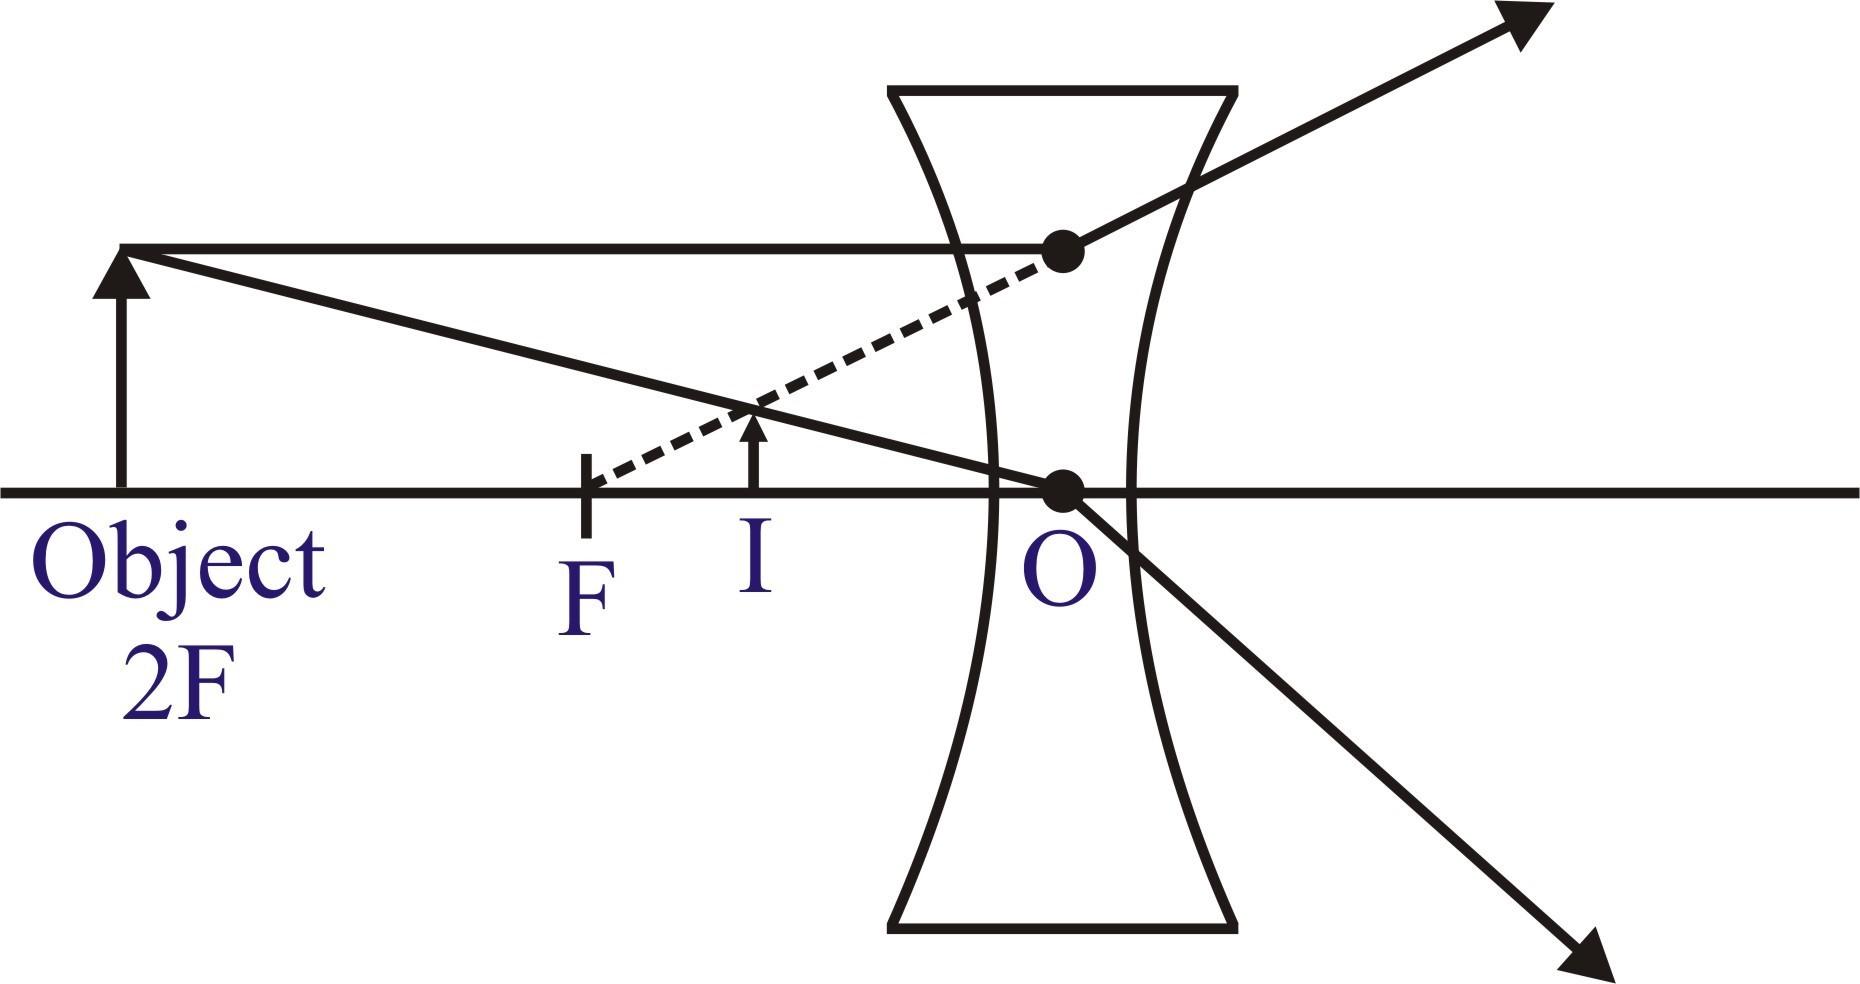 Concave Mirror Diagram Draw A Diagram To Show How Concave Mirror Act As A Converging Mirror